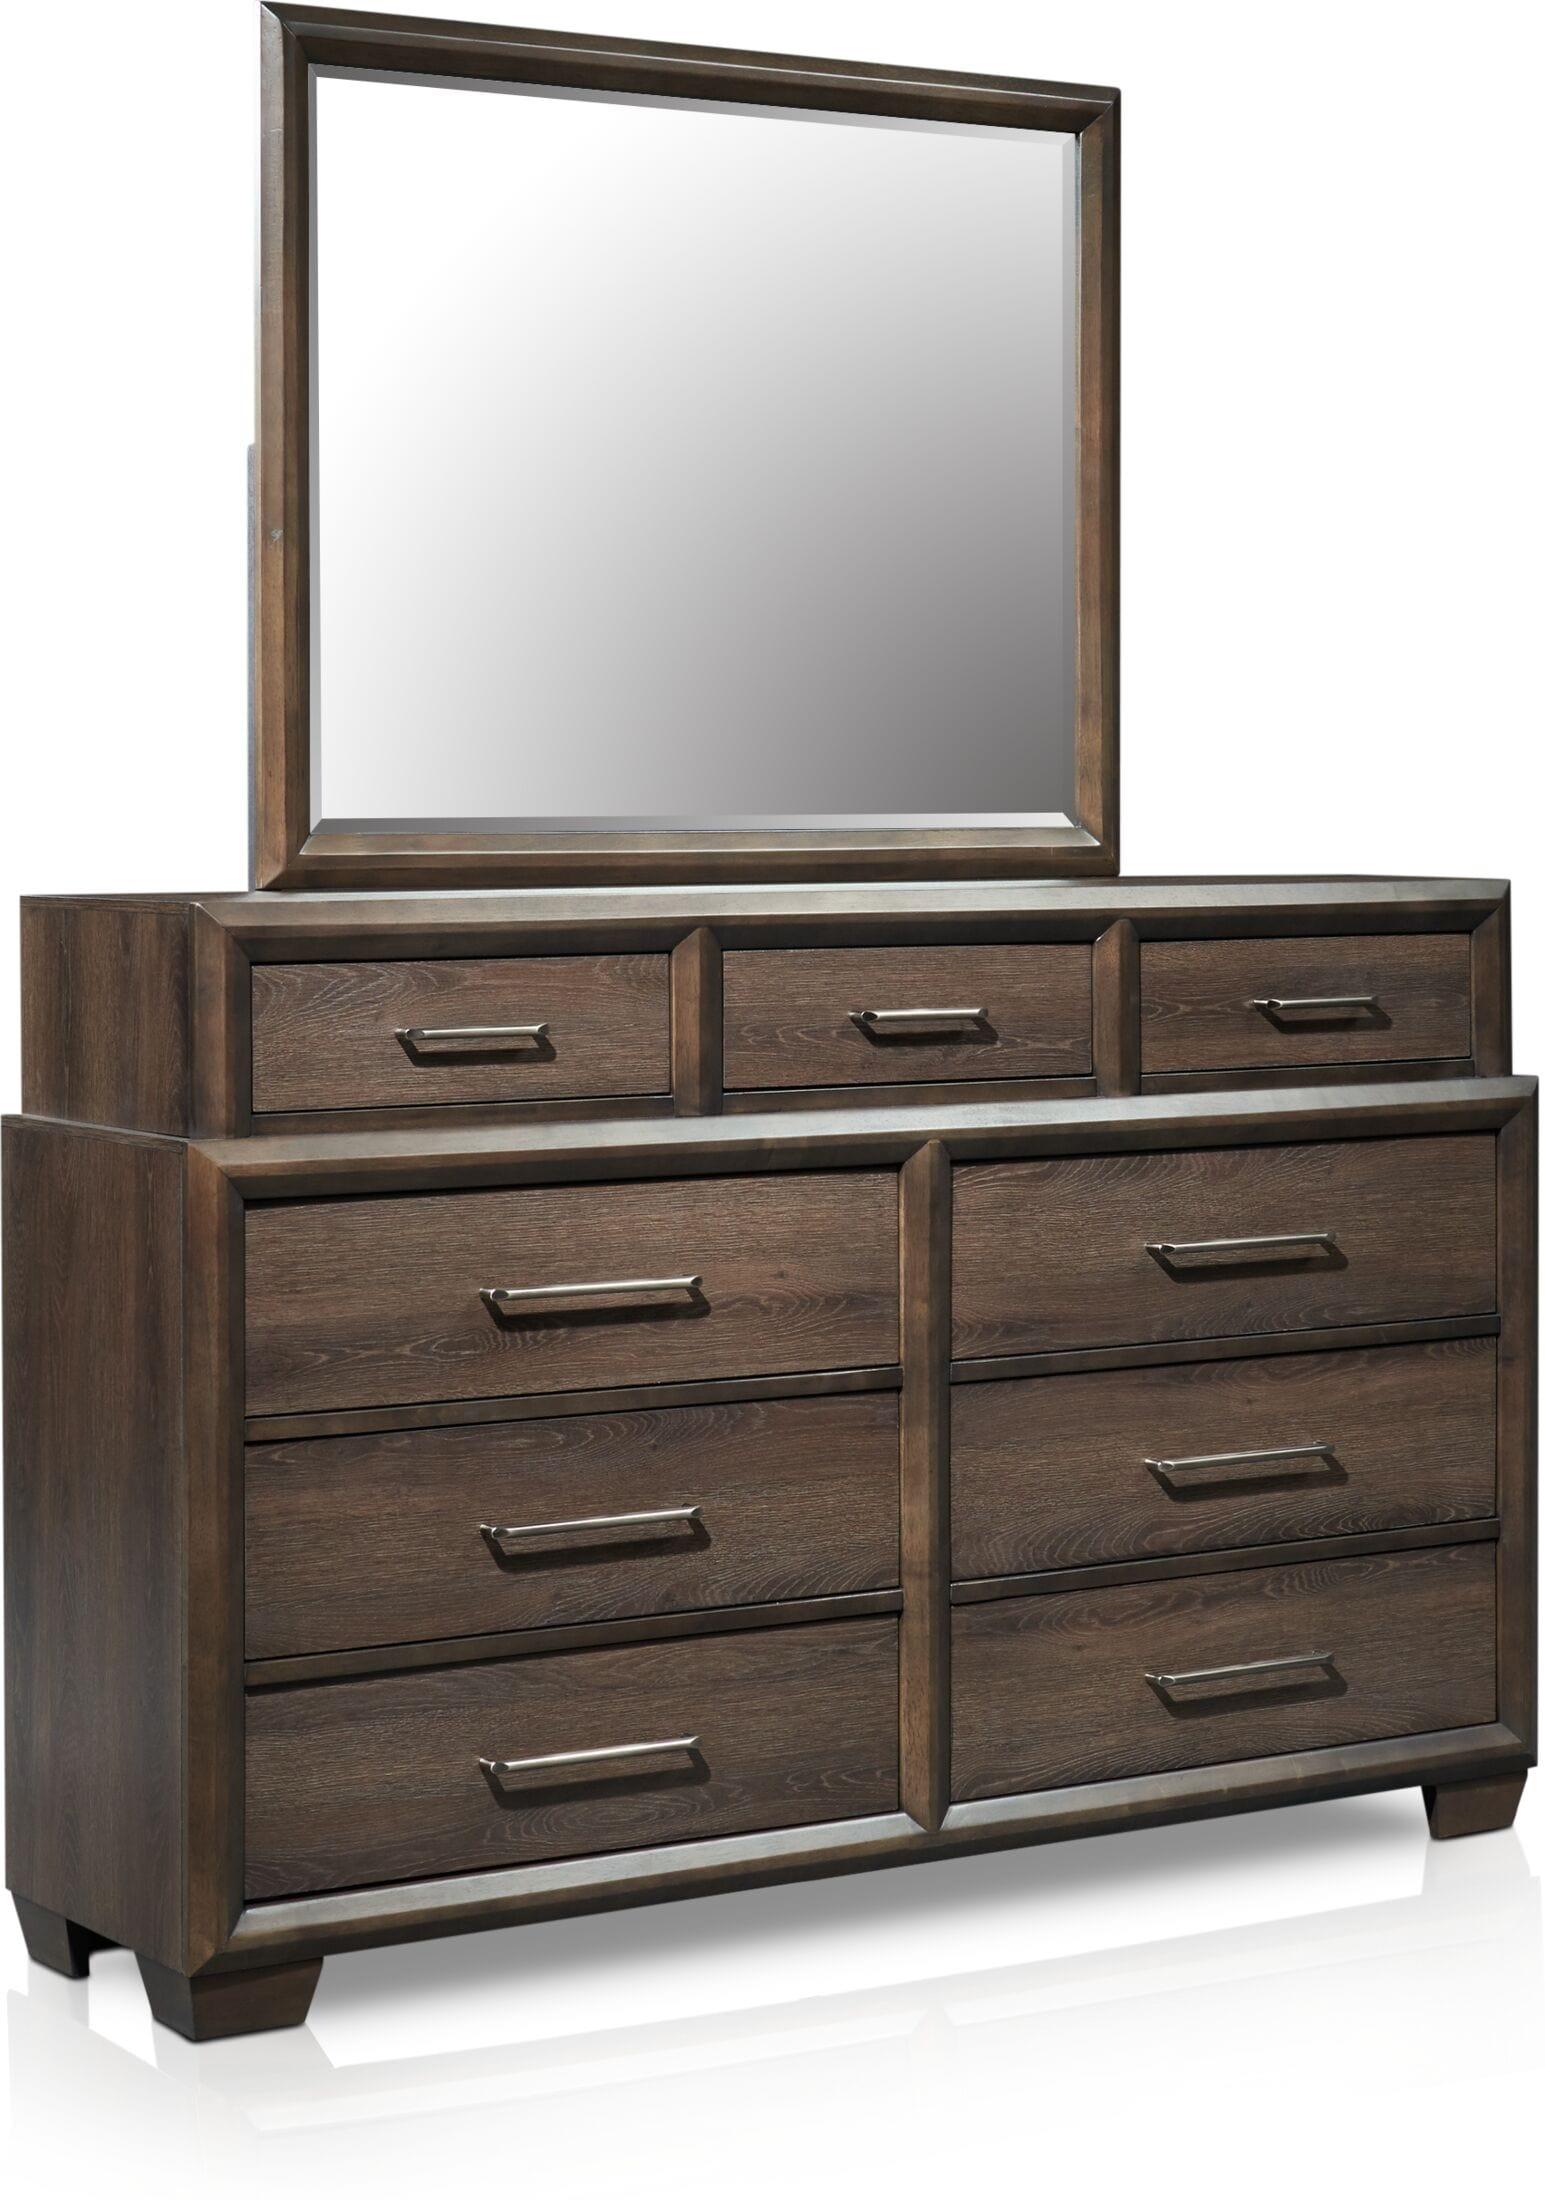 Bedroom Furniture - Dakota Dresser and Mirror